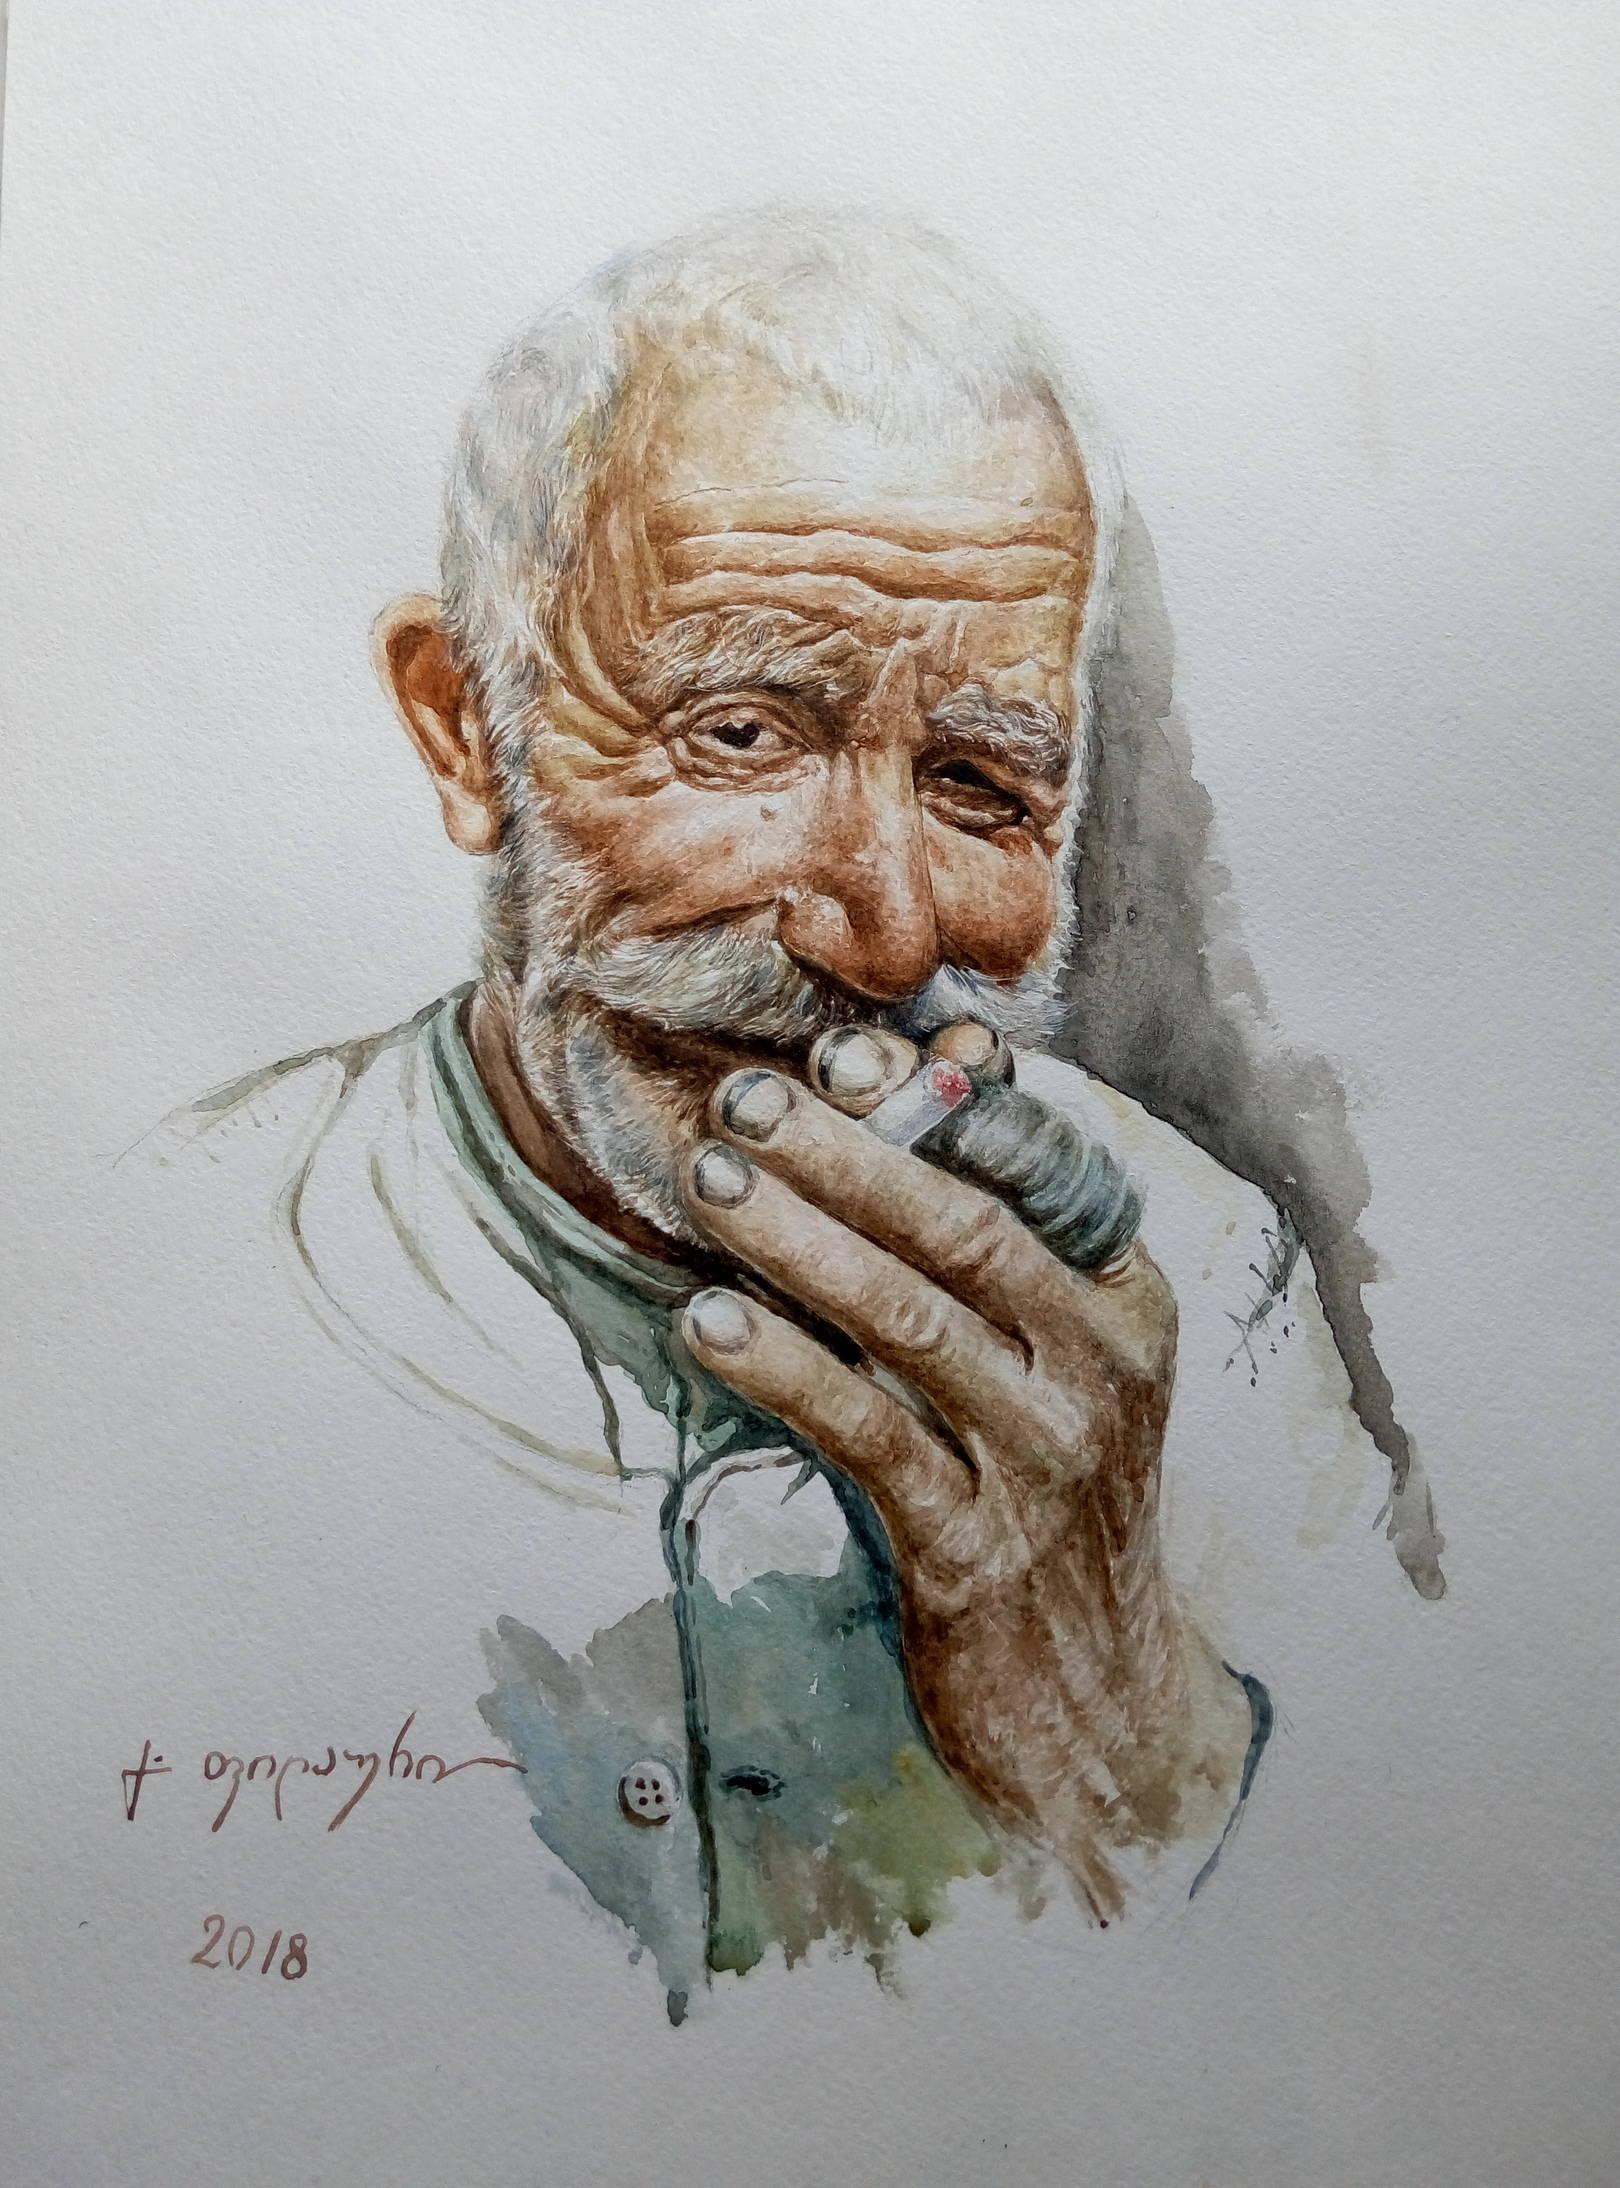 «Портрет старика»                    бумага, акварель (по фотографии Г. Тиканадзе) «Portrait of an old man»             paper, aquarelle                                              (by photo G. Tikanadze)                                          40x30, 2018